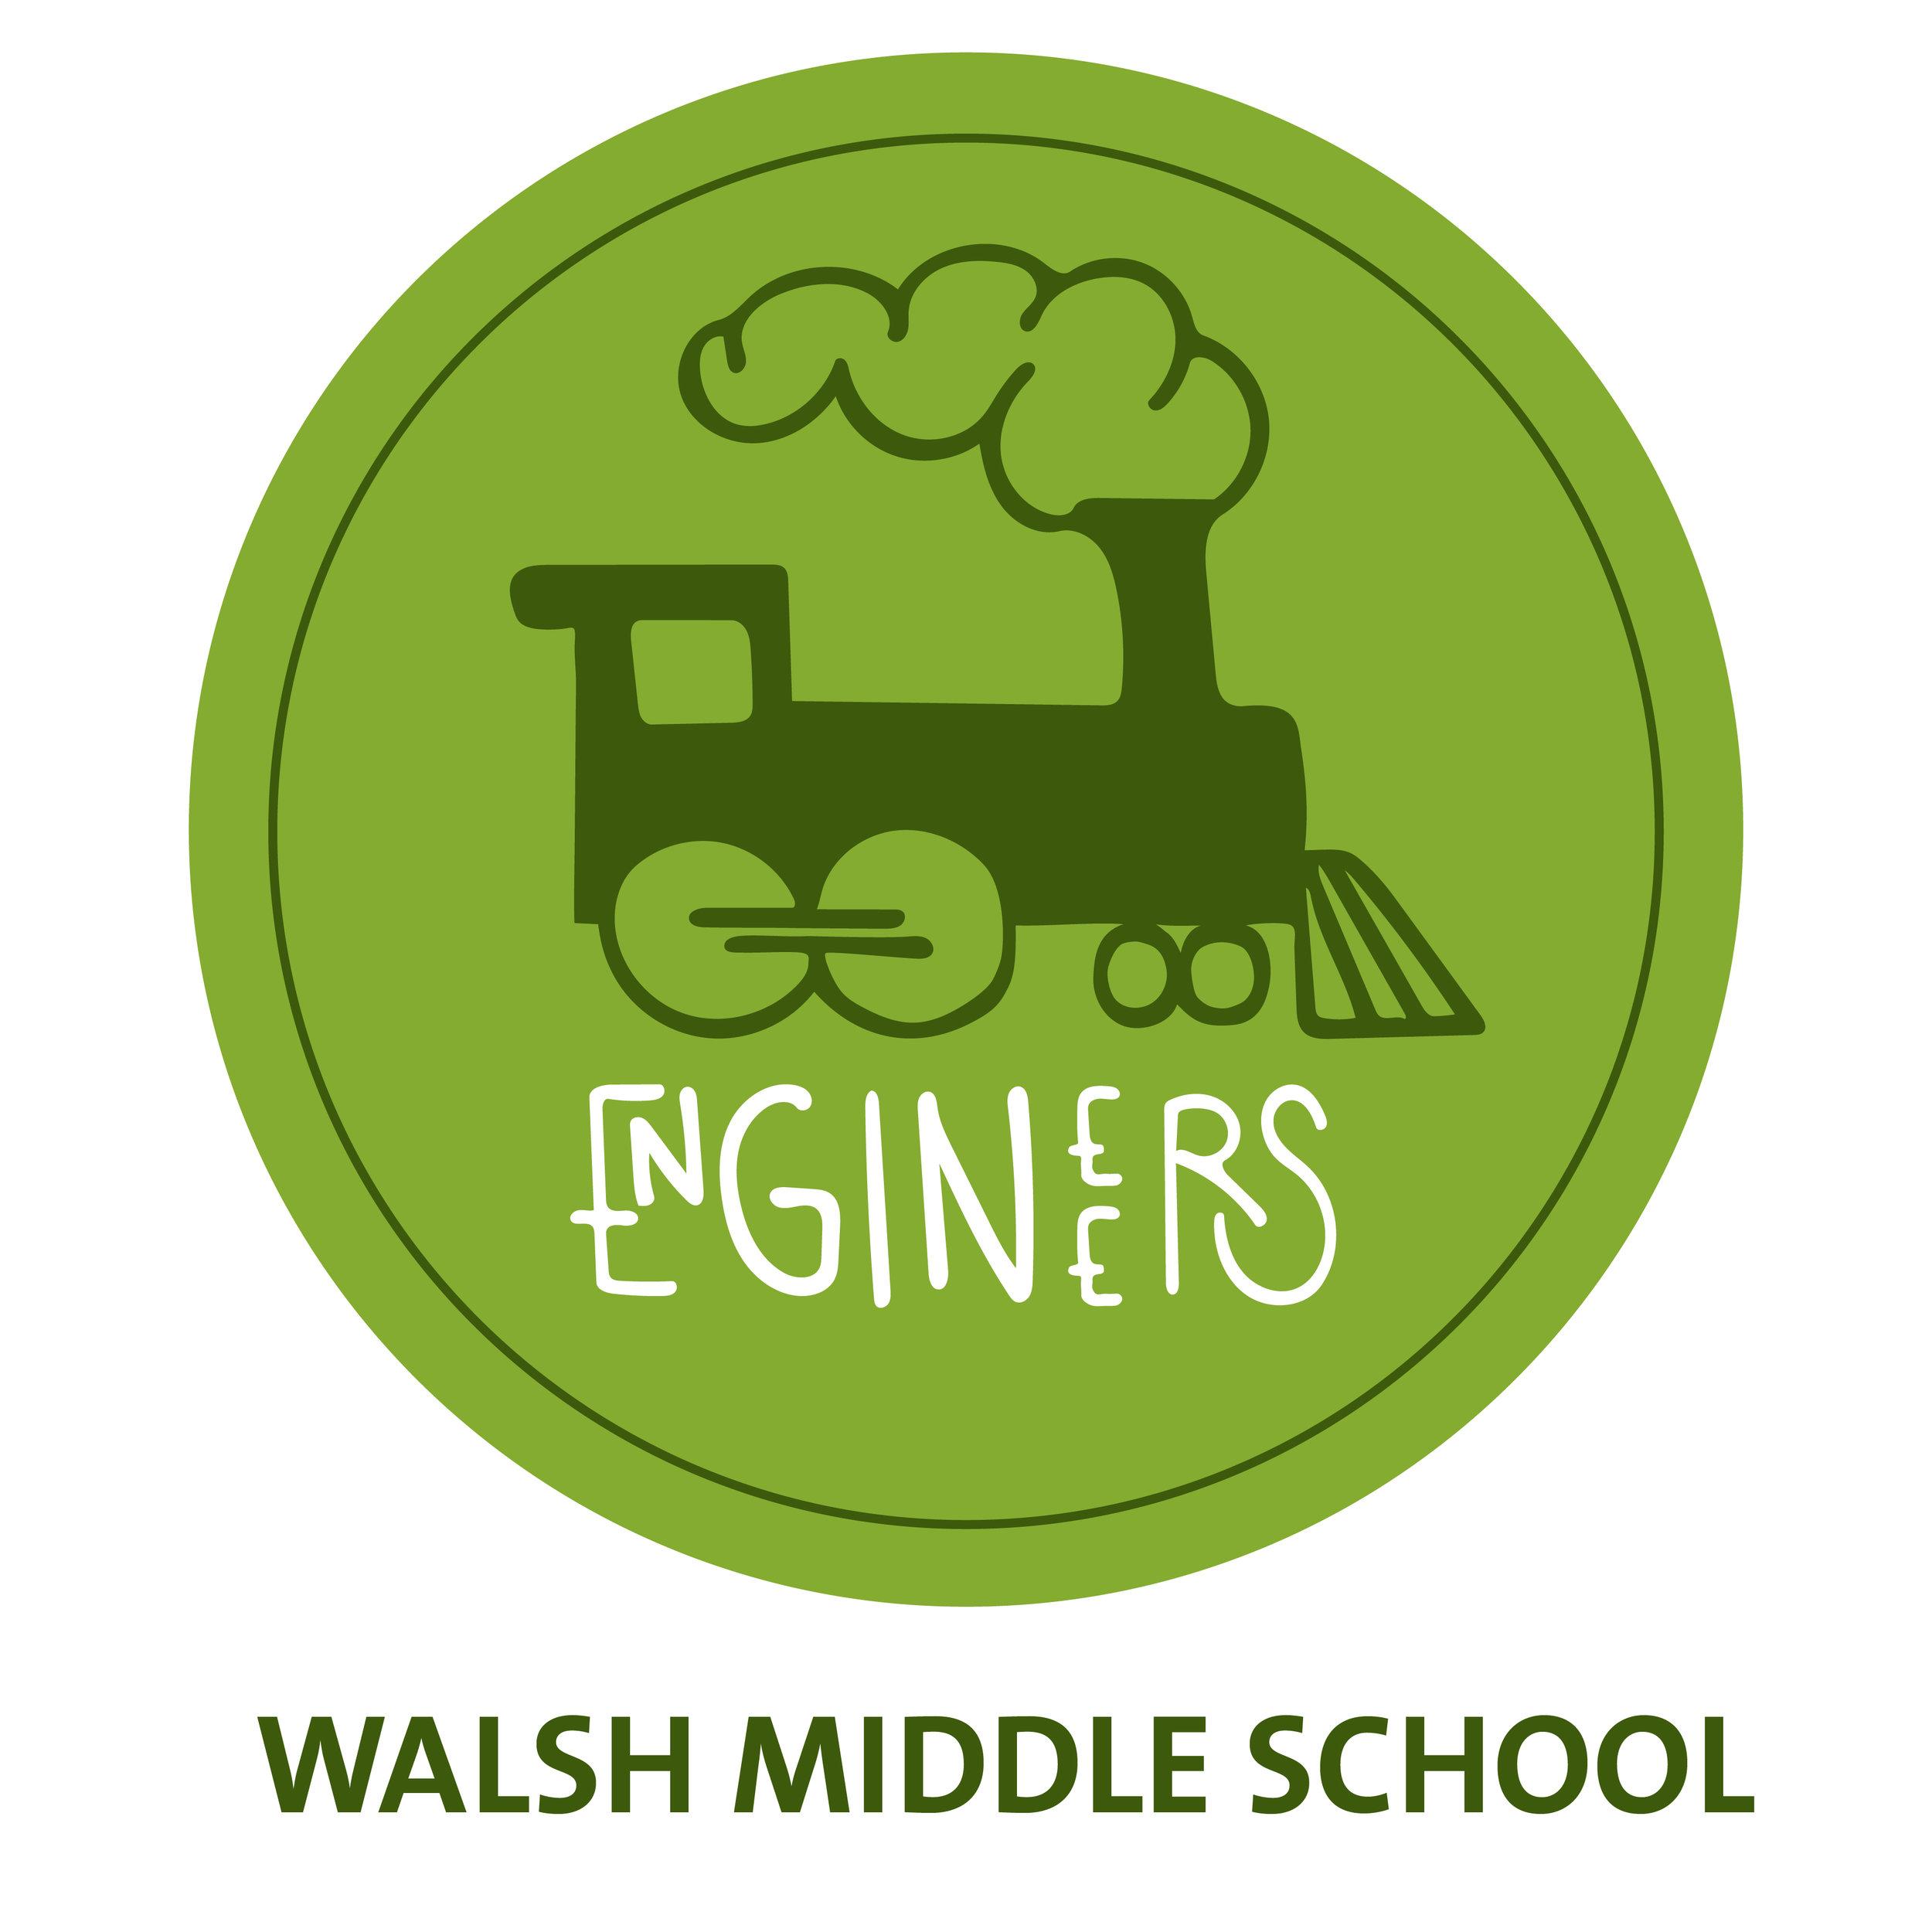 Middle School Logos-63.jpg